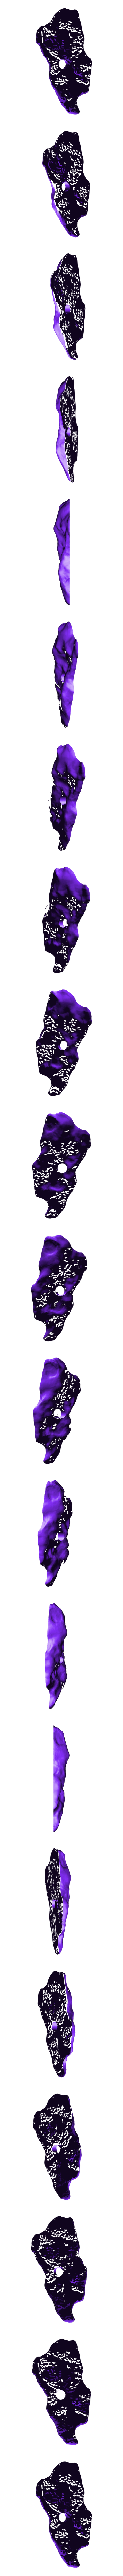 medium2.stl Download free STL file The Space Set • 3D print design, HeribertoValle